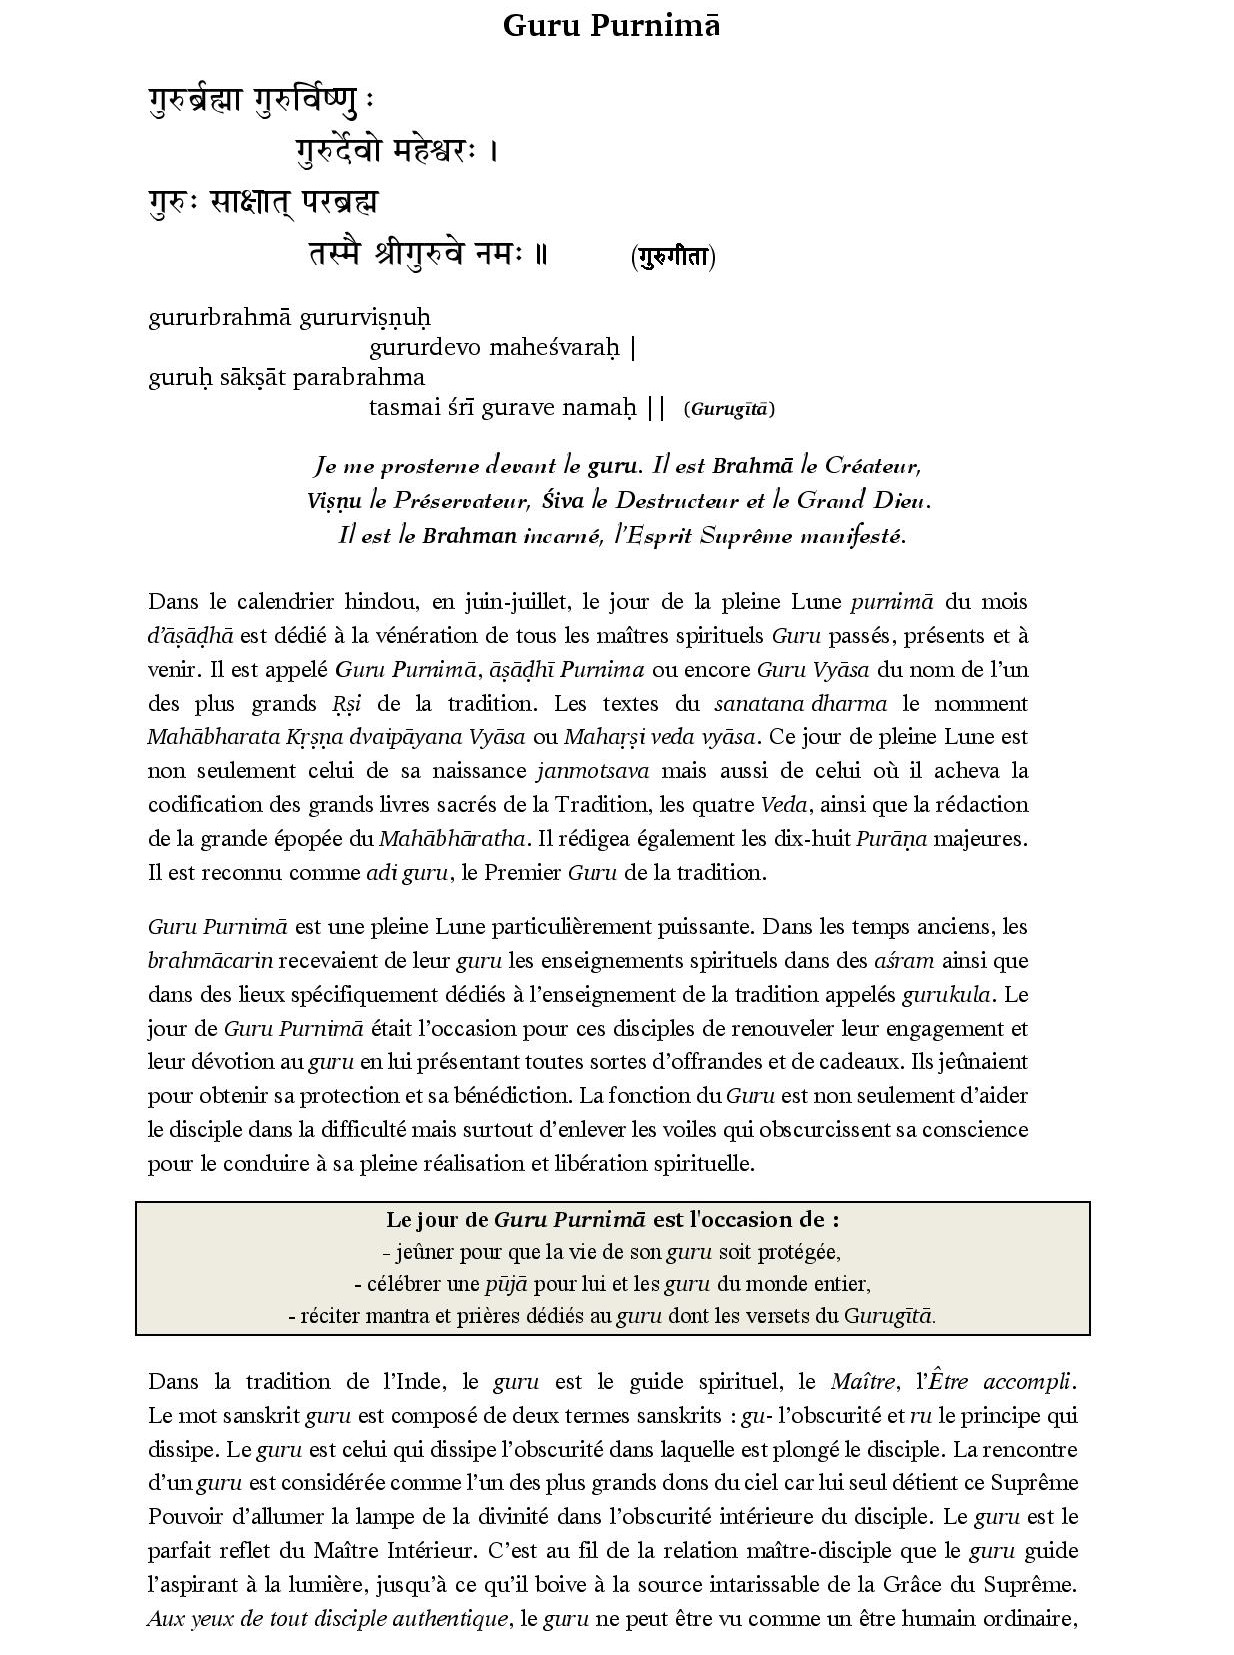 GURU PURNIMA ET HISTOIRE DU DISCIPLE-page-001